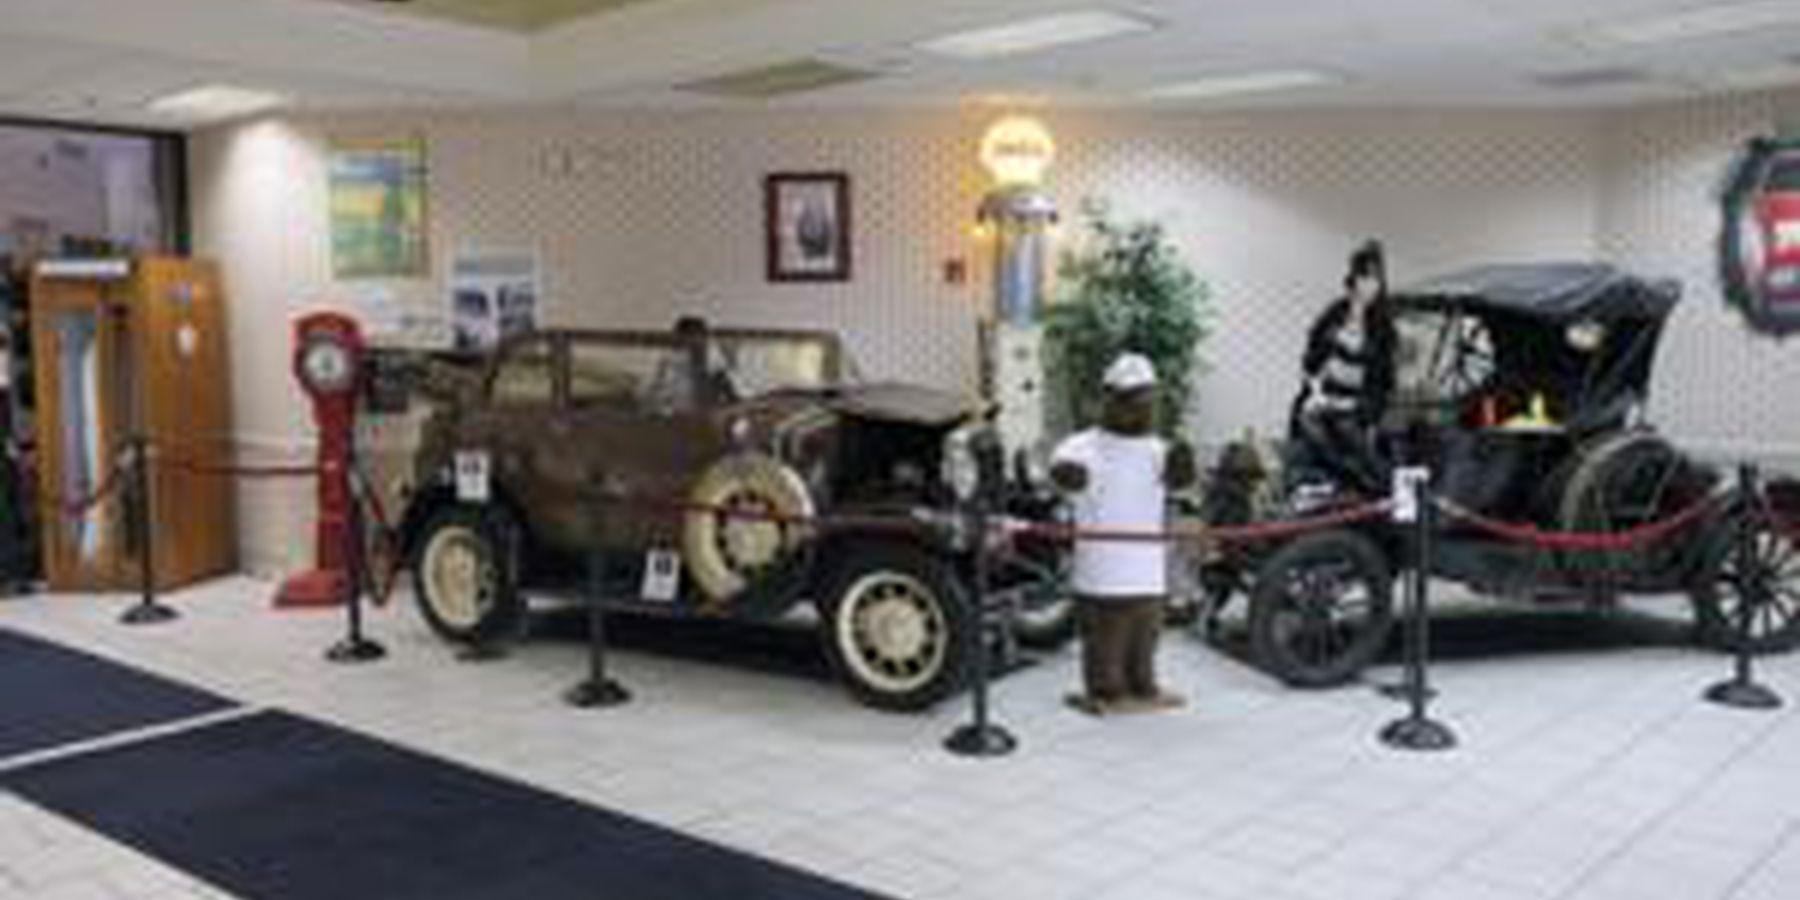 Route 66 Hotel - museum